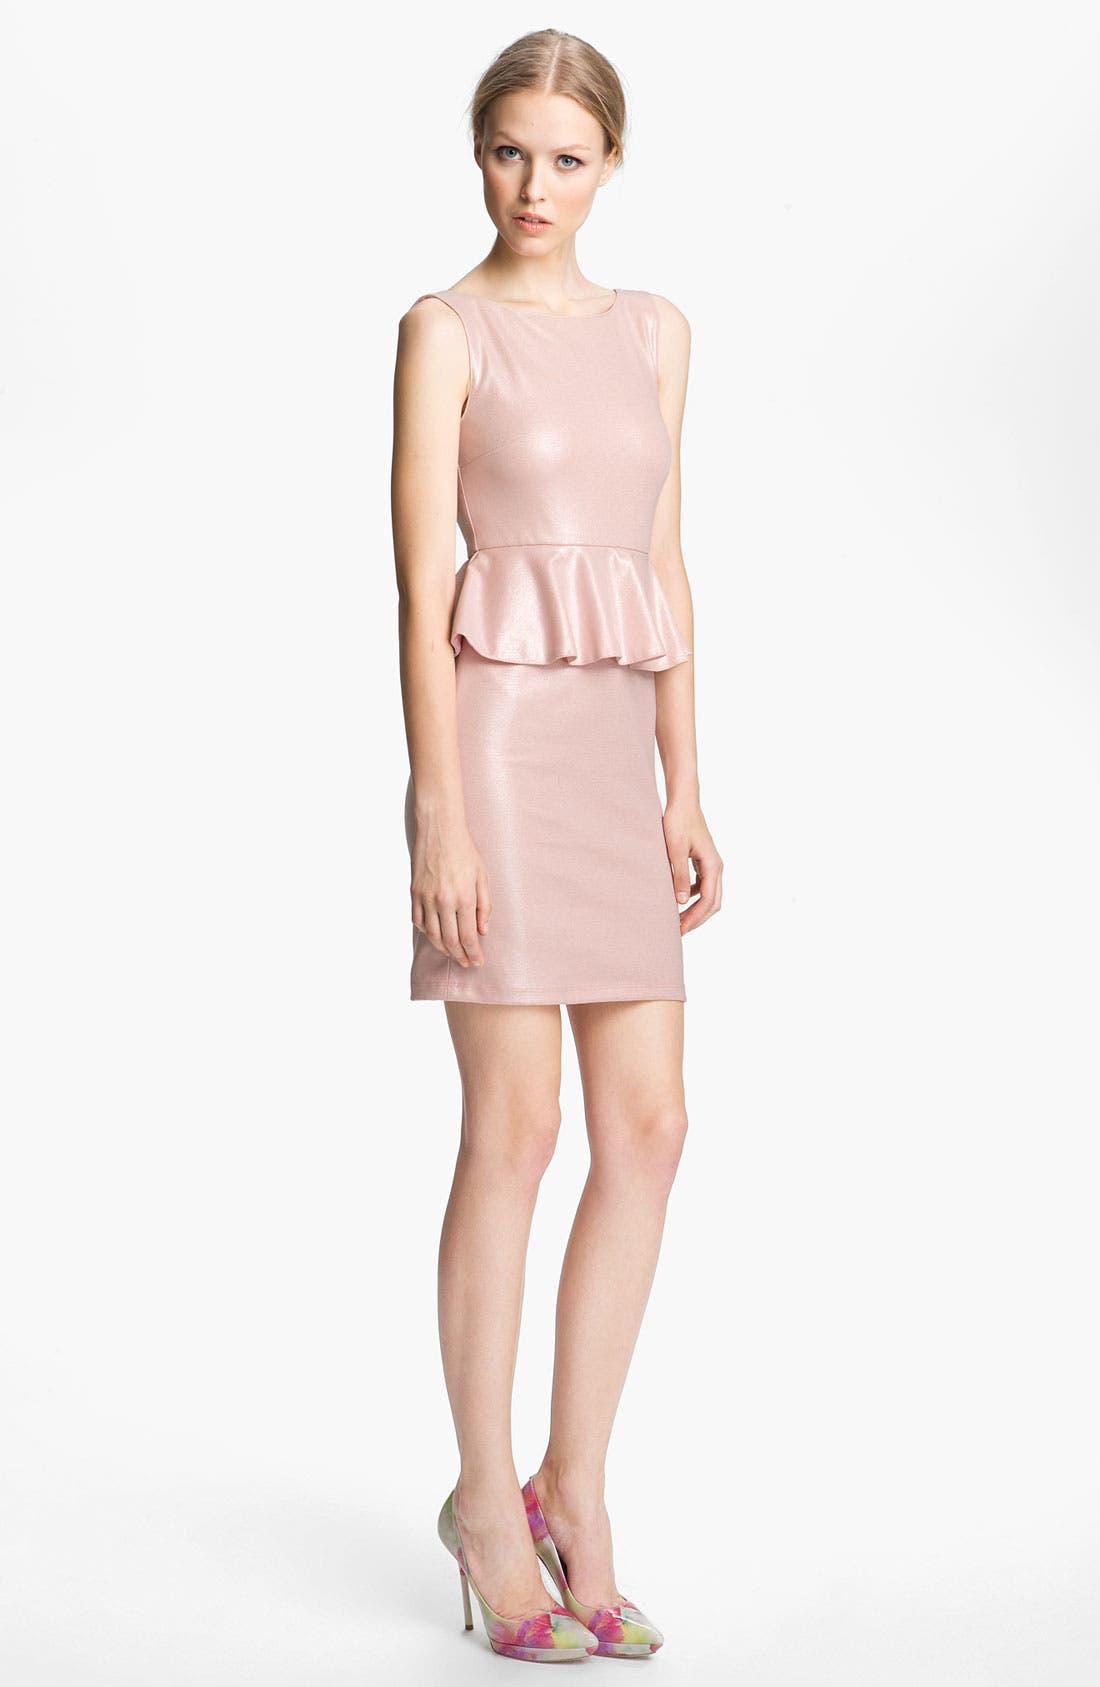 Alternate Image 1 Selected - Alice + Olivia Peplum Dress